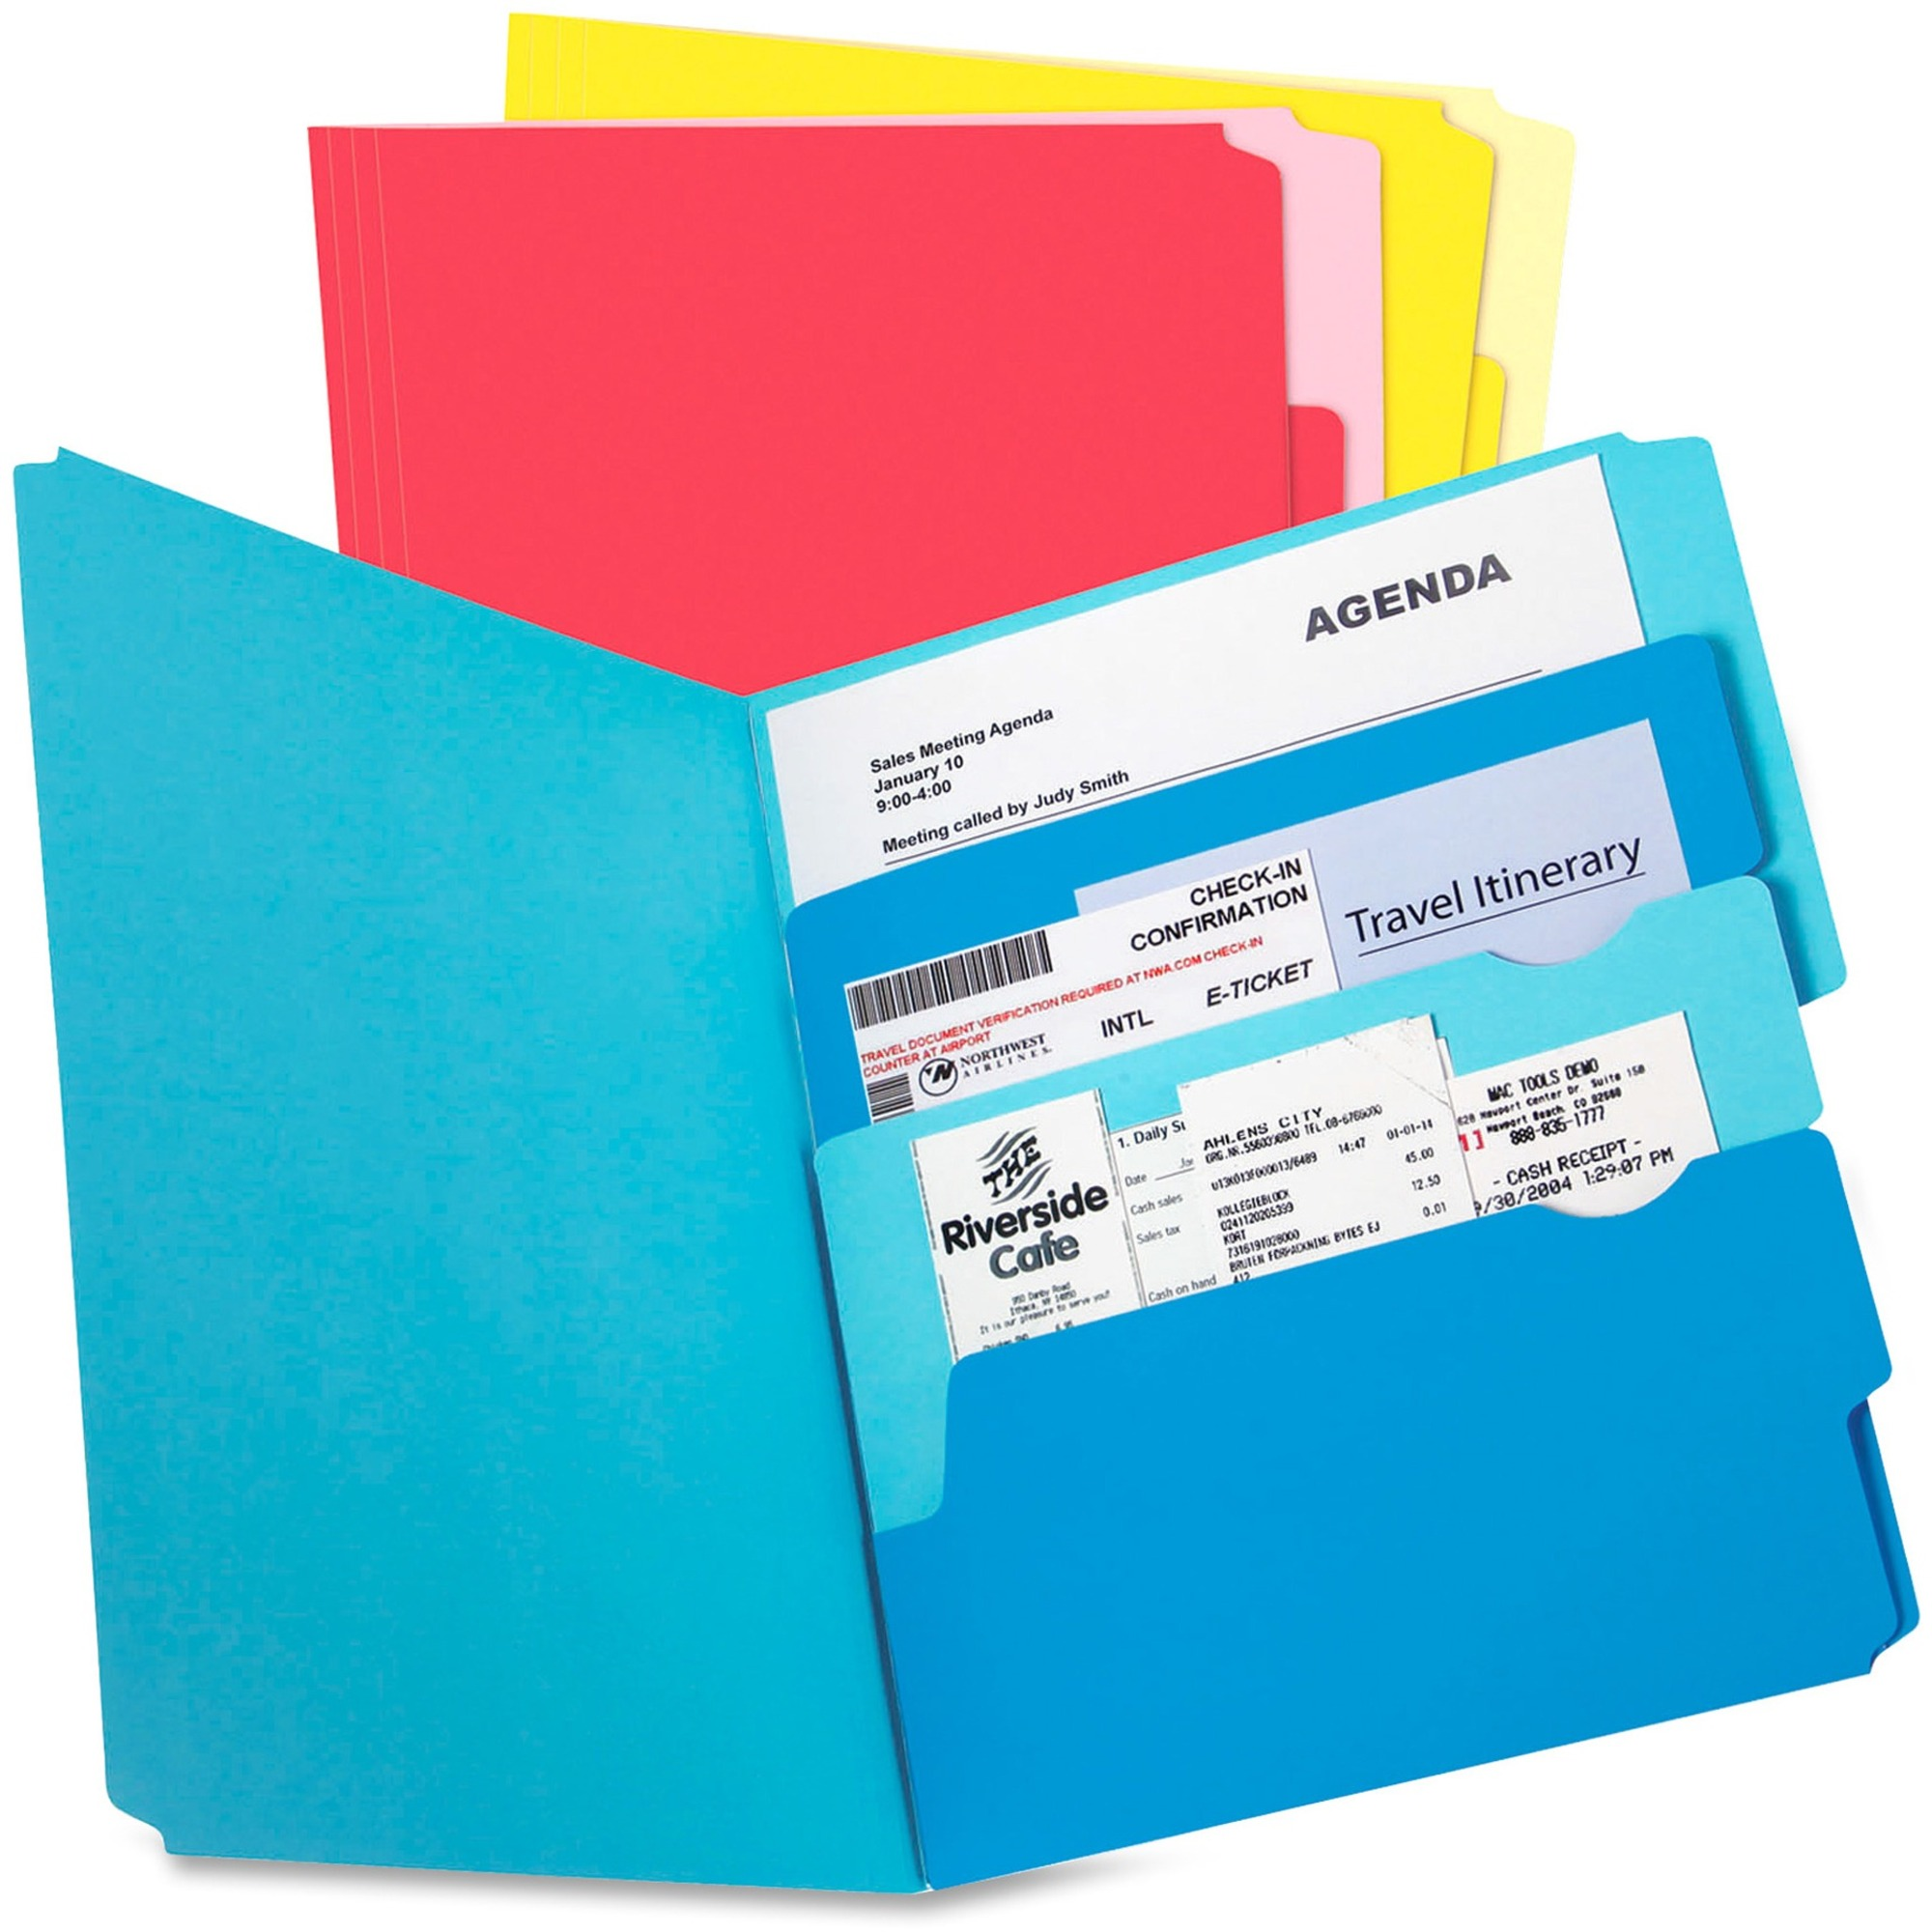 Pendaflex Divide It Up Multi Section File Folder Madill The